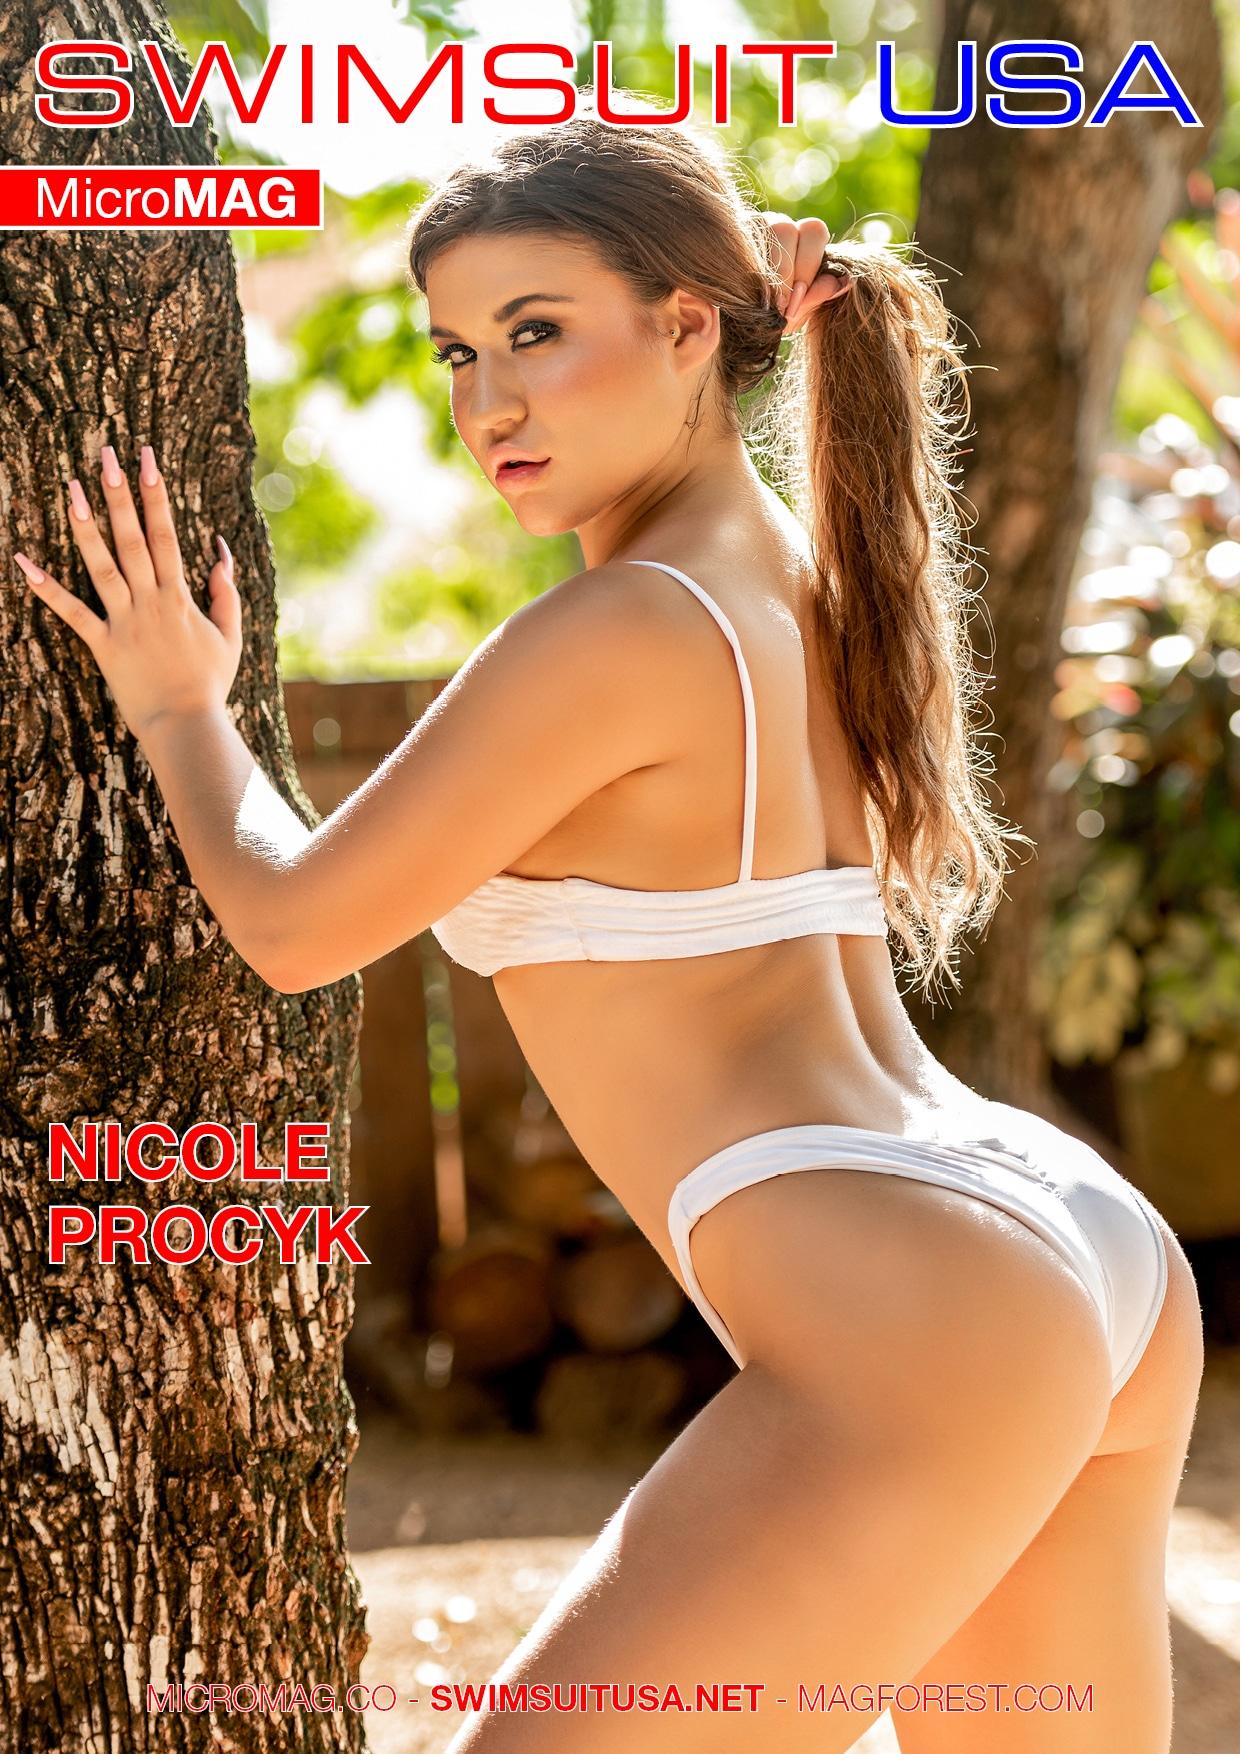 Swimsuit USA MicroMAG - Nicole Procyk 2